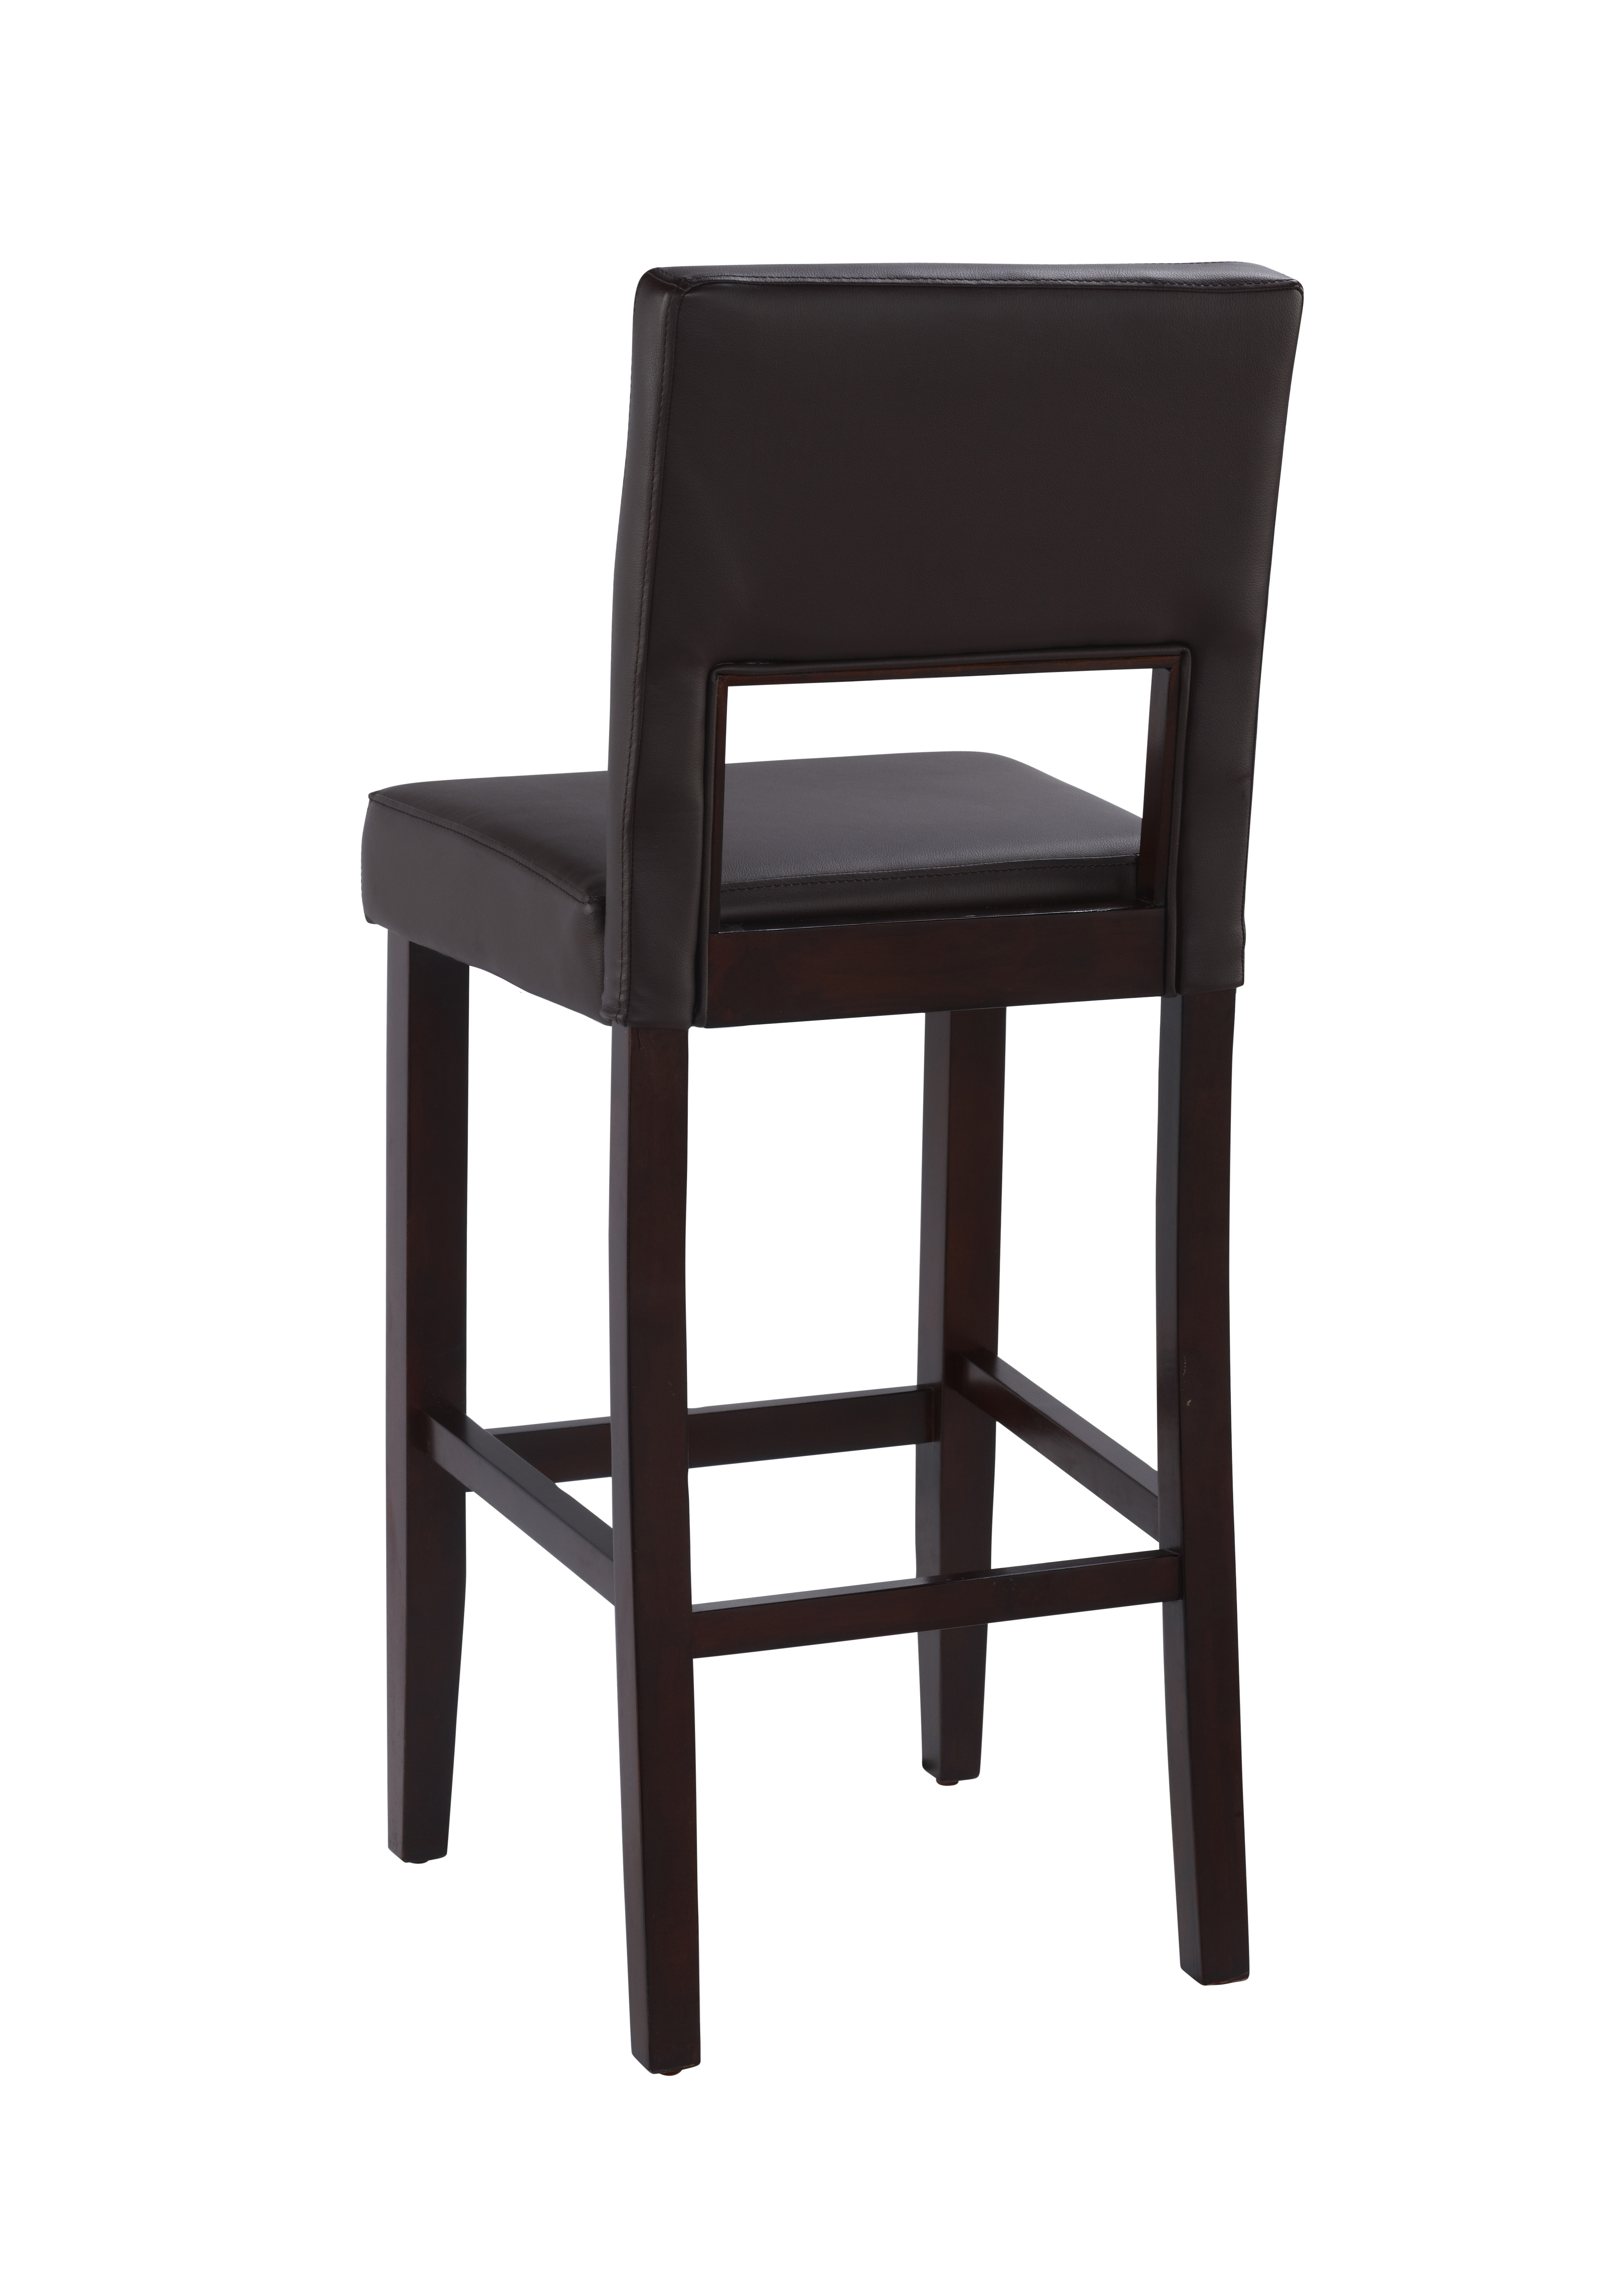 Excellent Linon Vega 30 Bar Stool Multiple Colors Unemploymentrelief Wooden Chair Designs For Living Room Unemploymentrelieforg